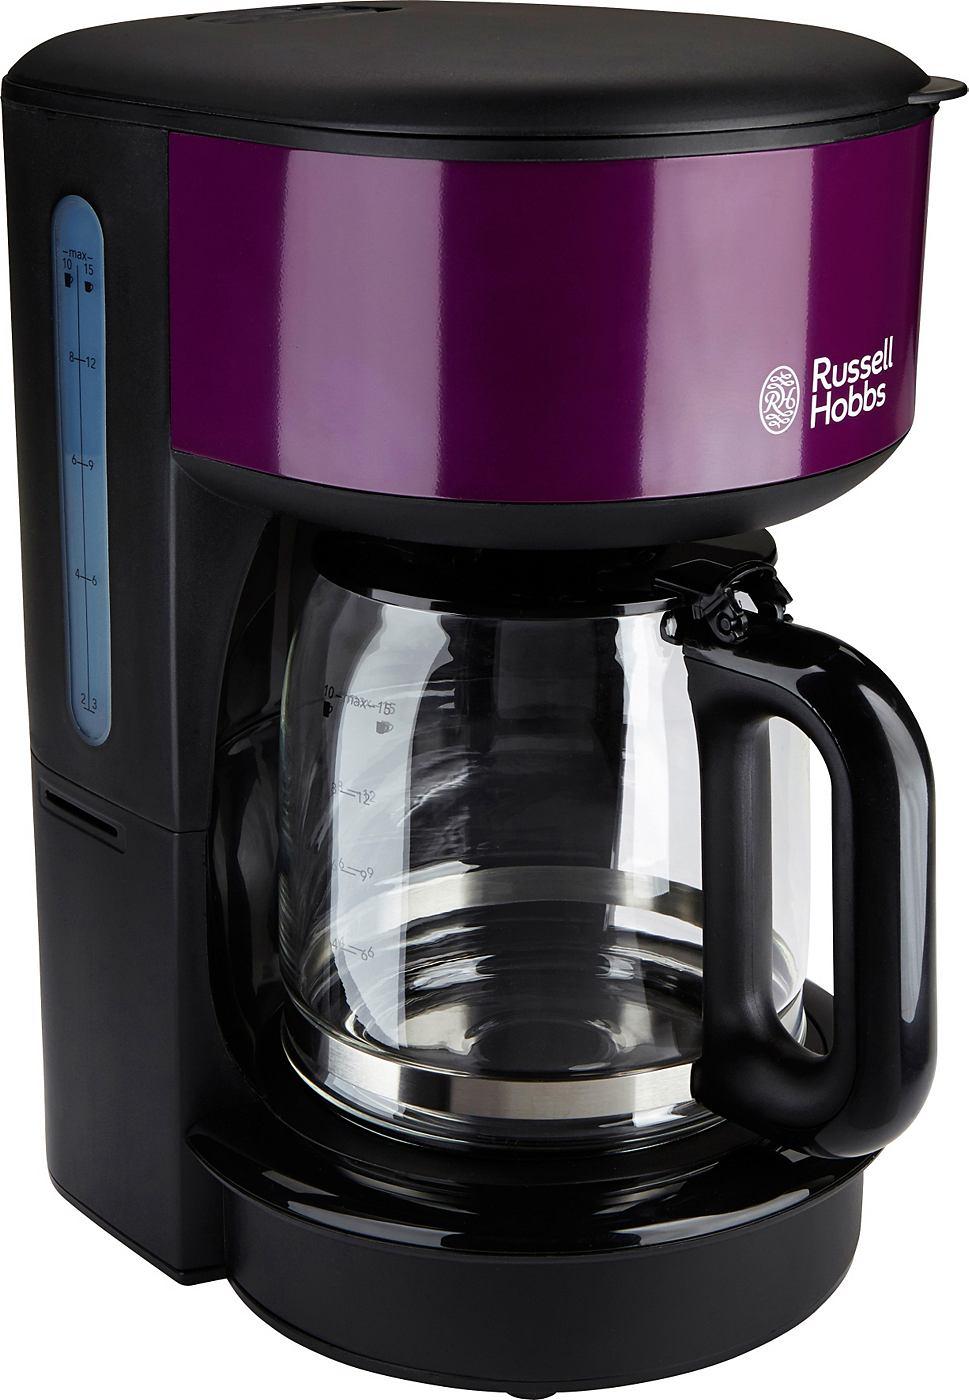 Russell Hobbs Kaffeemaschine purple 20133-56